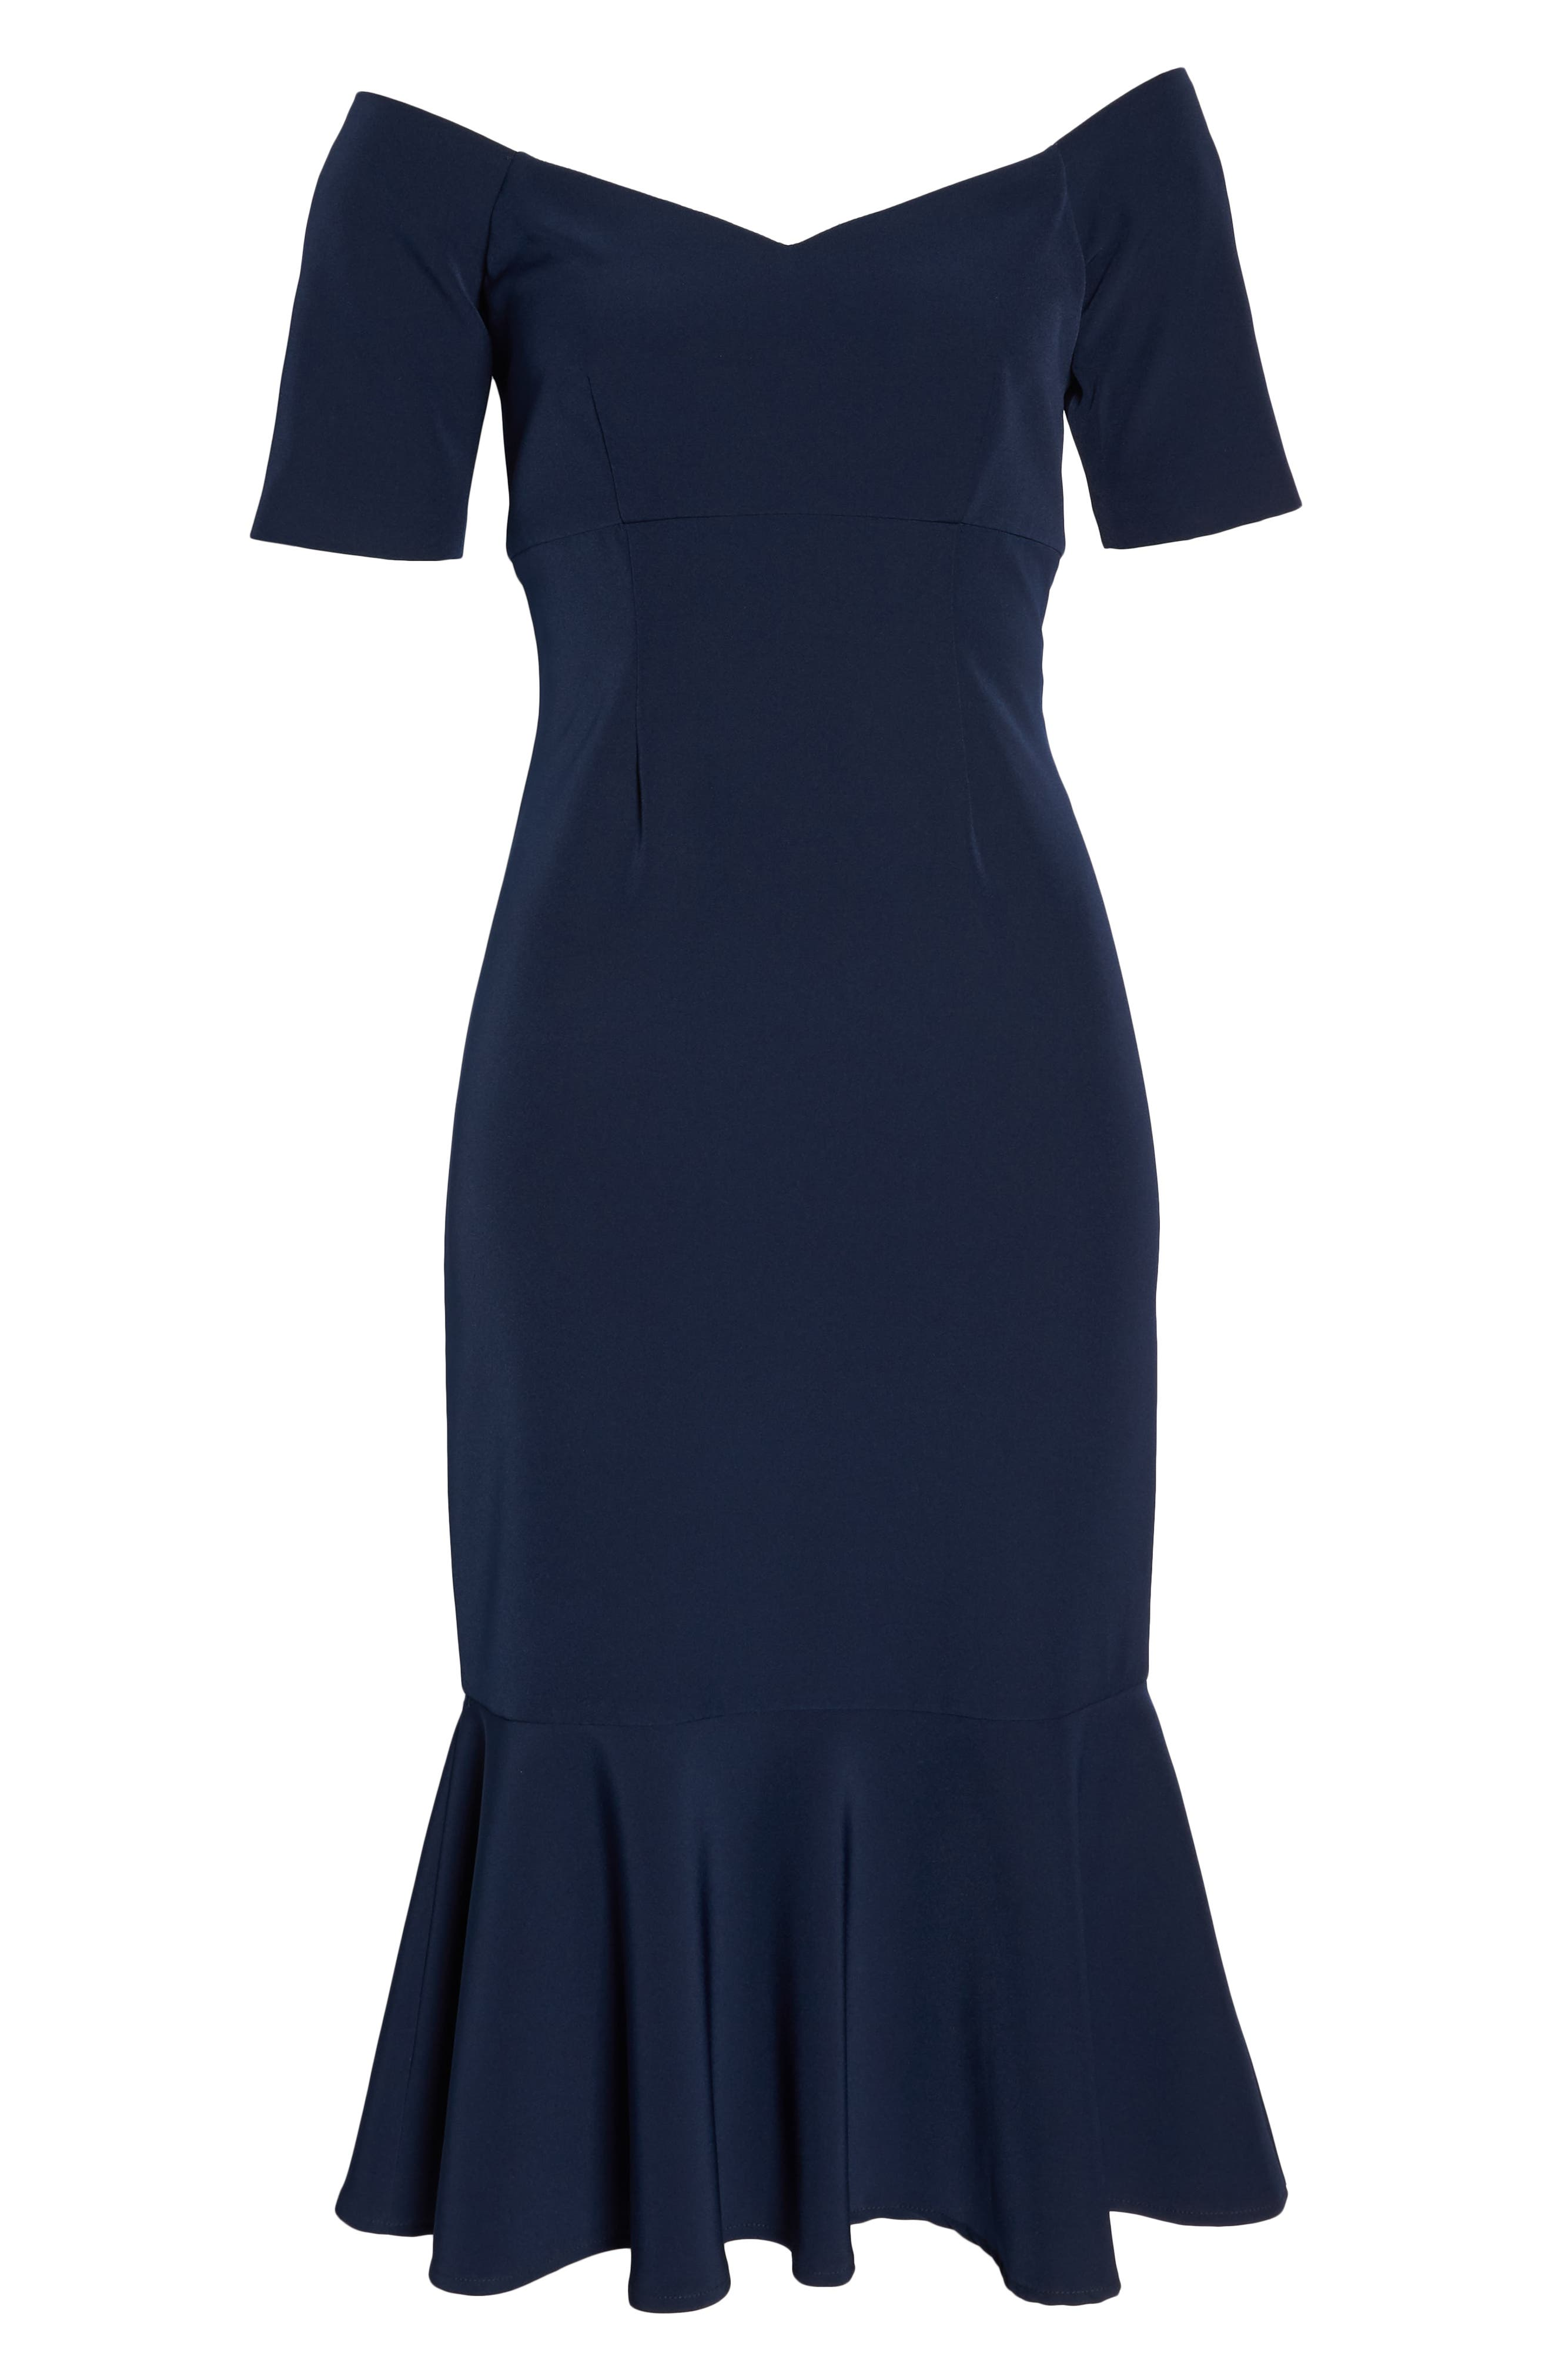 MAGGY LONDON,                             Dream Crepe Off the Shoulder Midi Dress,                             Alternate thumbnail 7, color,                             410